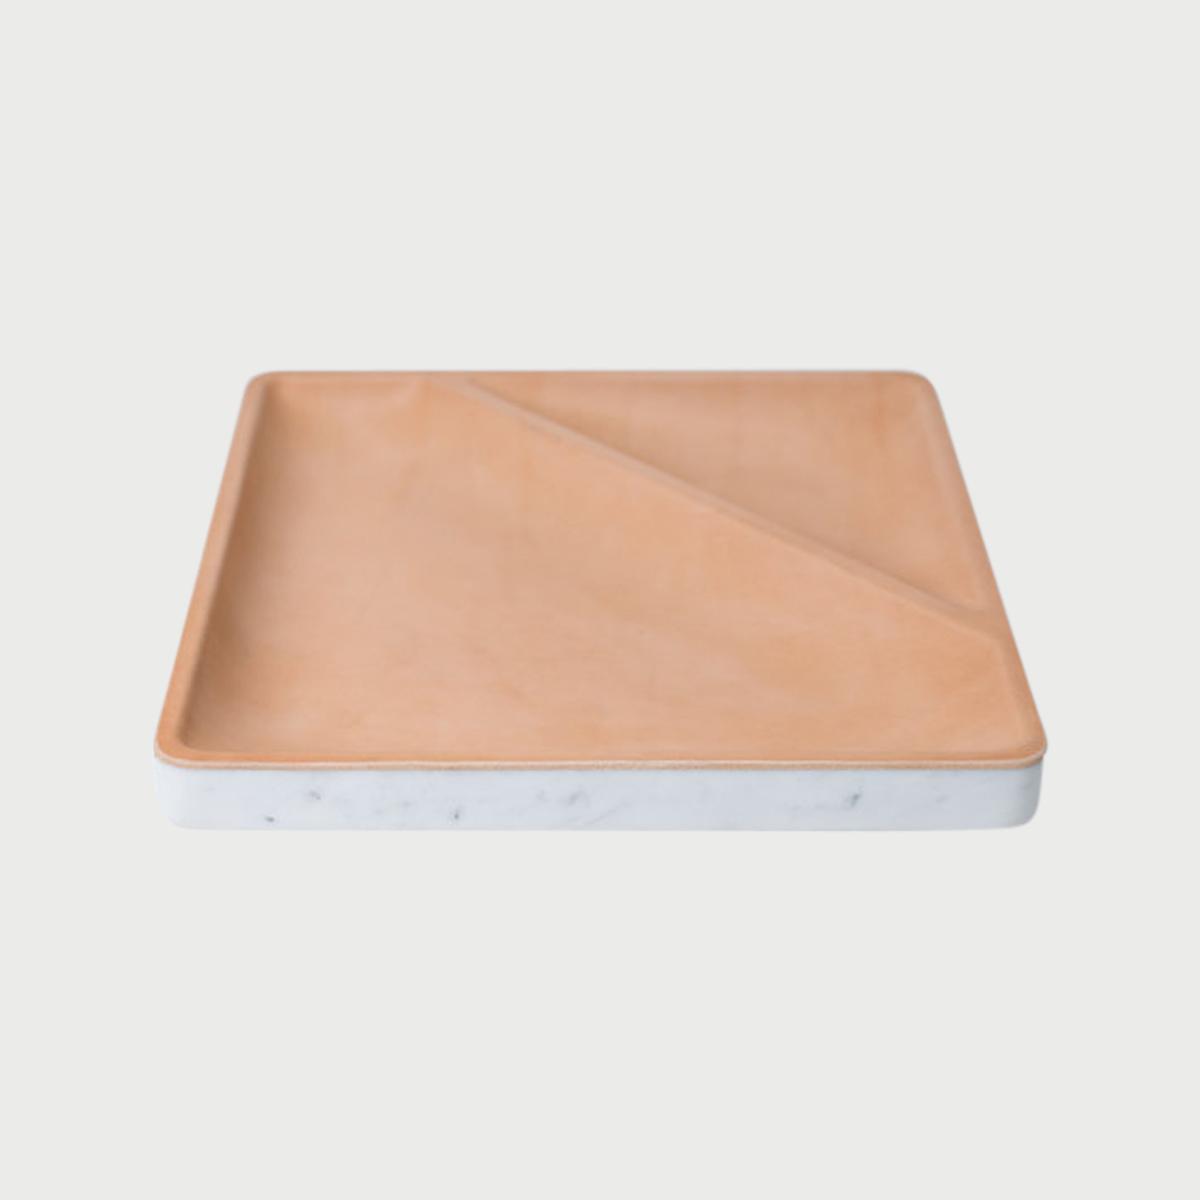 New trays oct 5th 1300